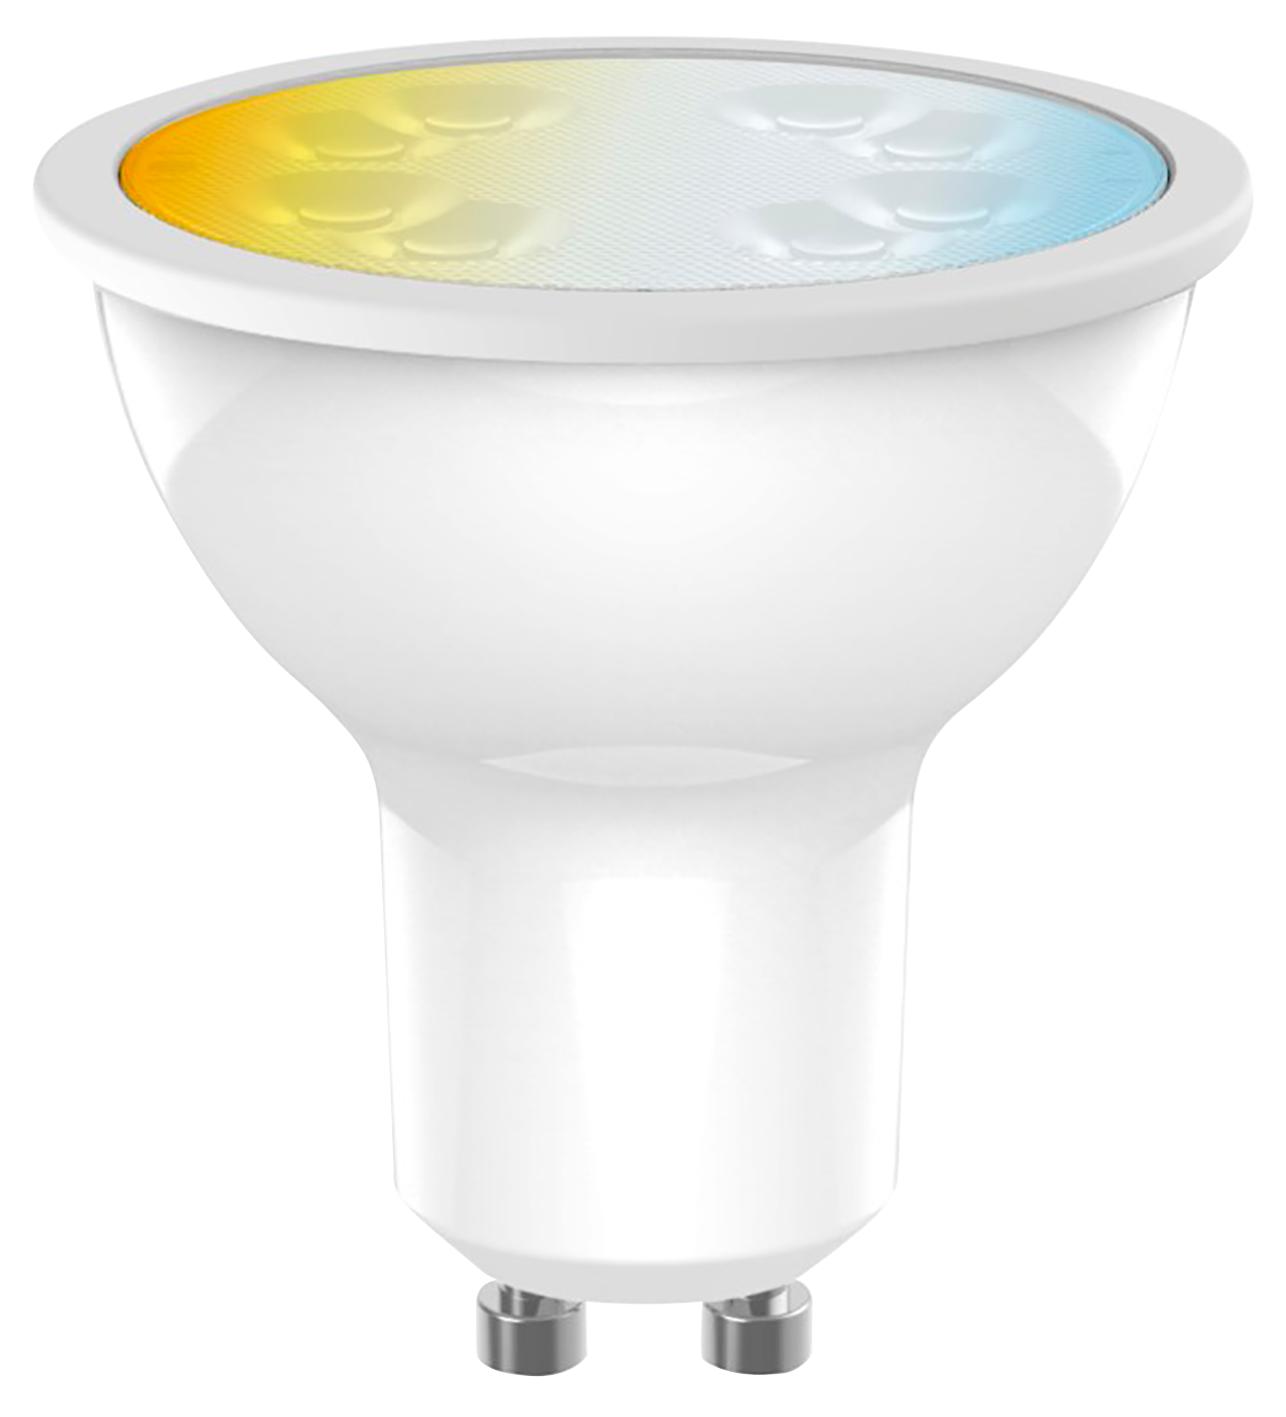 LED Strahler ''tint'', GU10, 5W, 350 lm, 2700-6500K, Smart Home, Zigbee